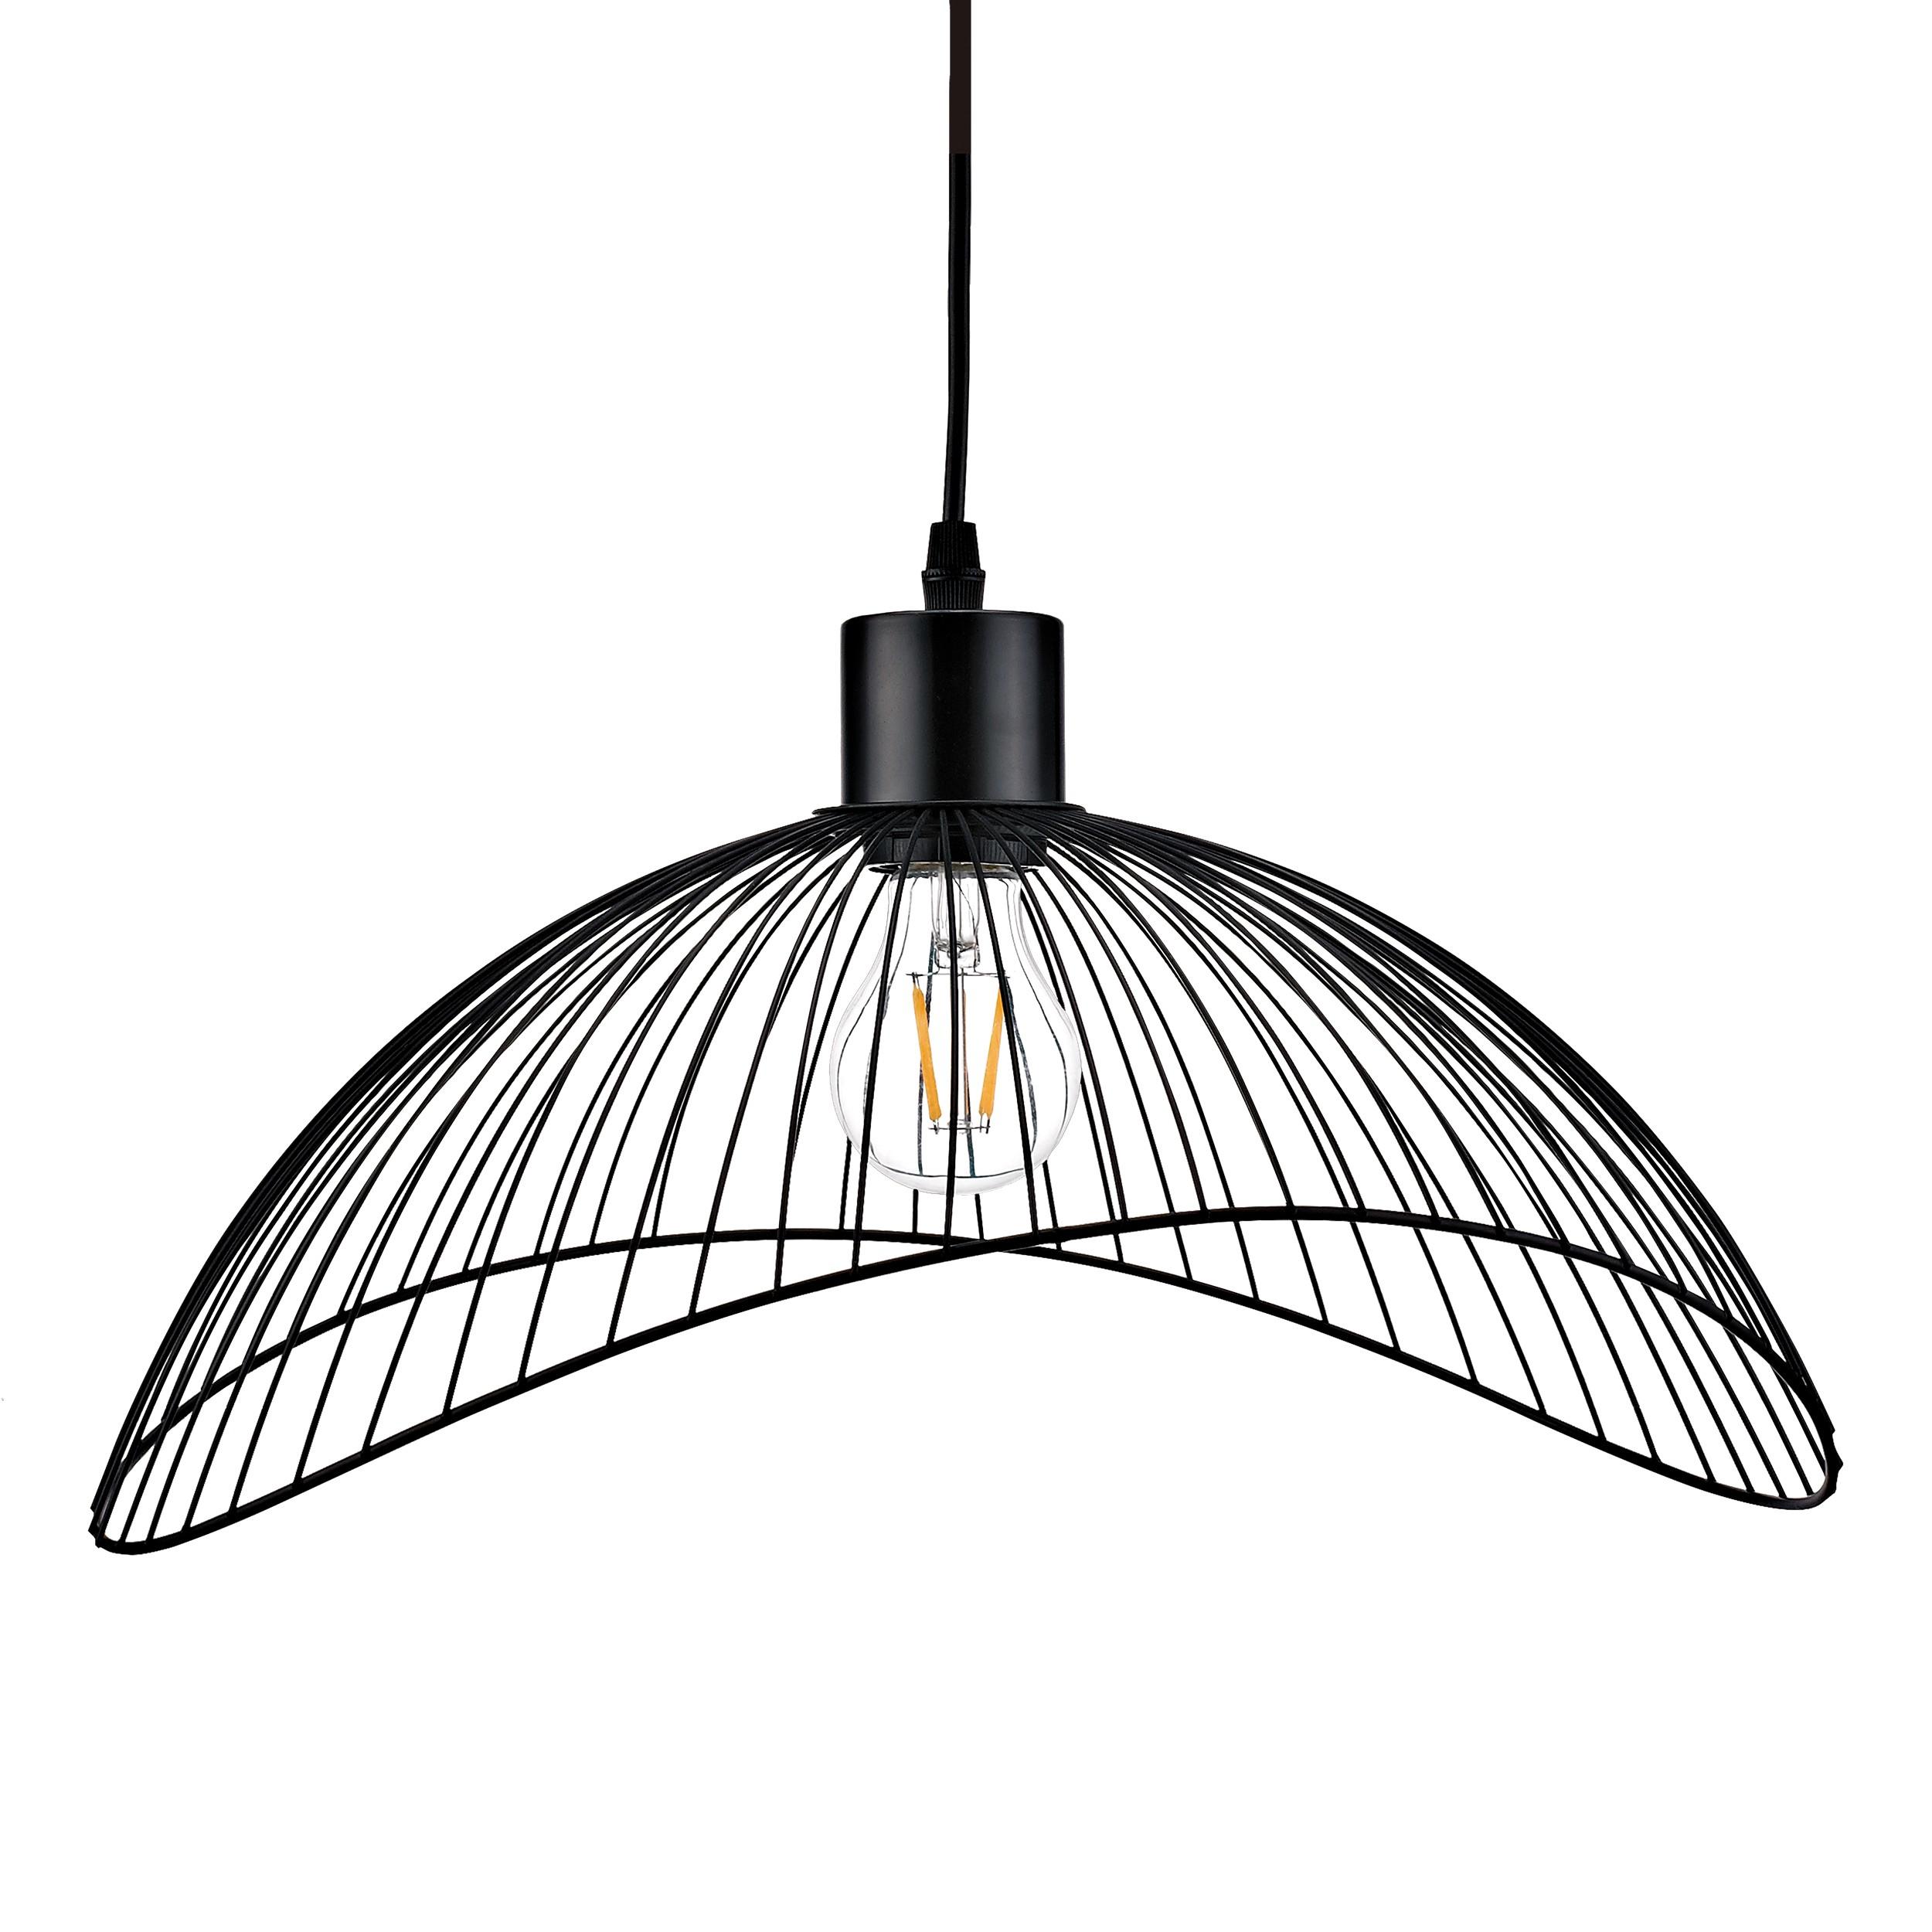 Lampa wisząca AJE-HOLLY 5 Black 1xE27 40cm